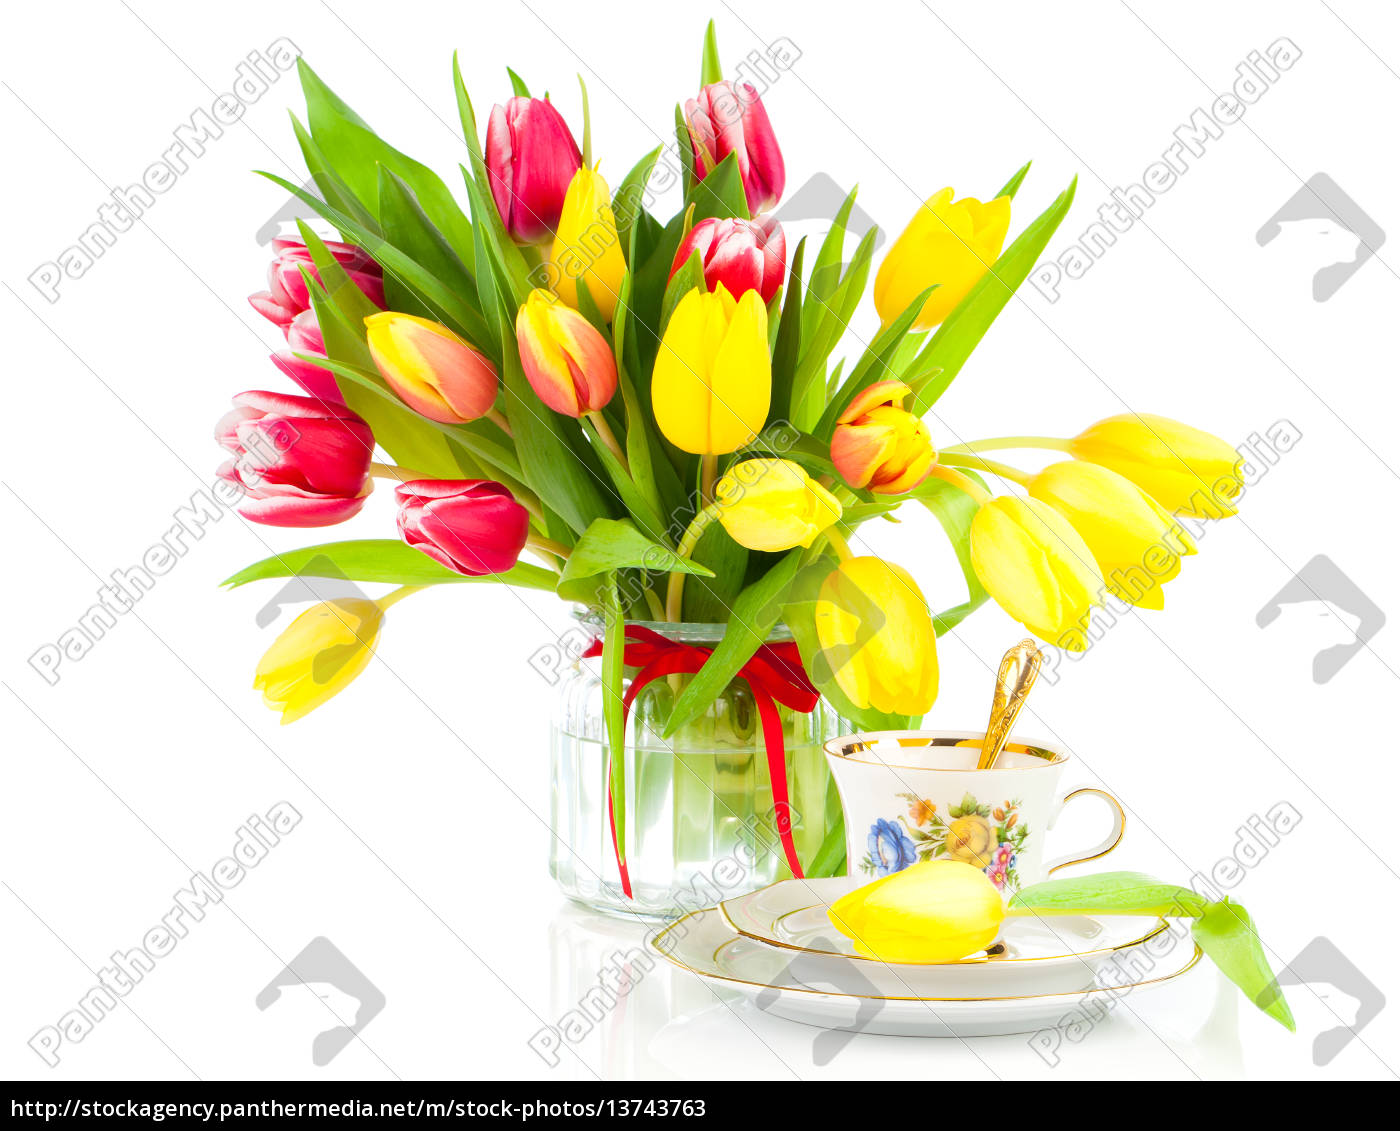 gelbe tulpen blumen mit tasse tee lizenzfreies bild 13743763 bildagentur panthermedia. Black Bedroom Furniture Sets. Home Design Ideas